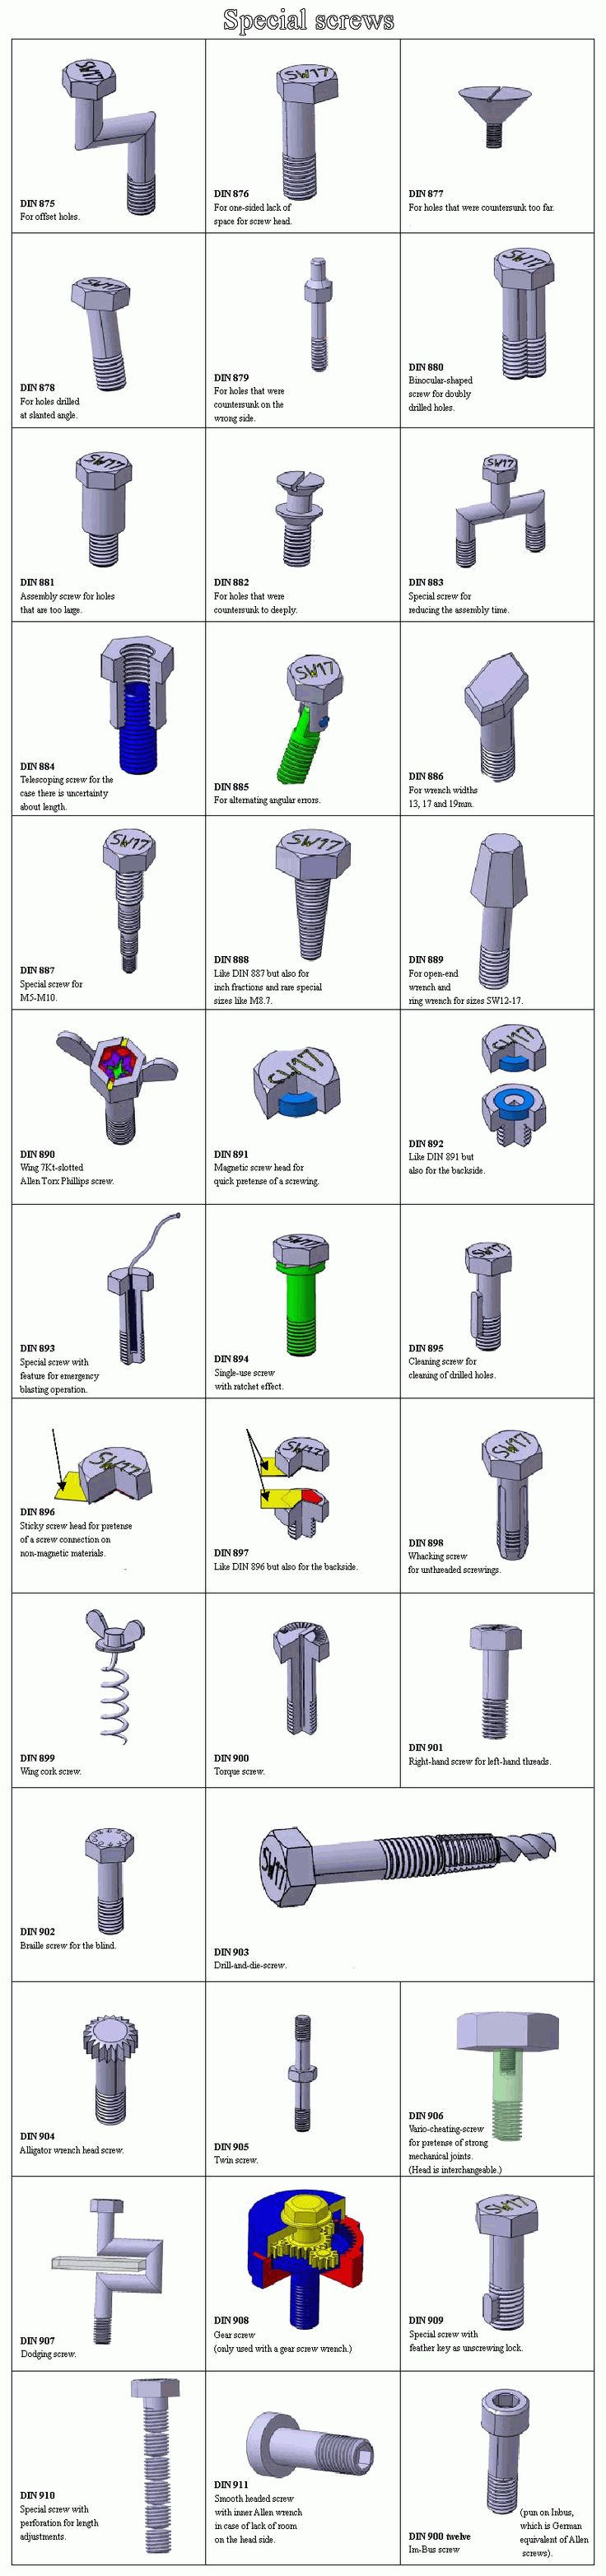 "Joke ""special screws"" chart – HomemadeTools.net"